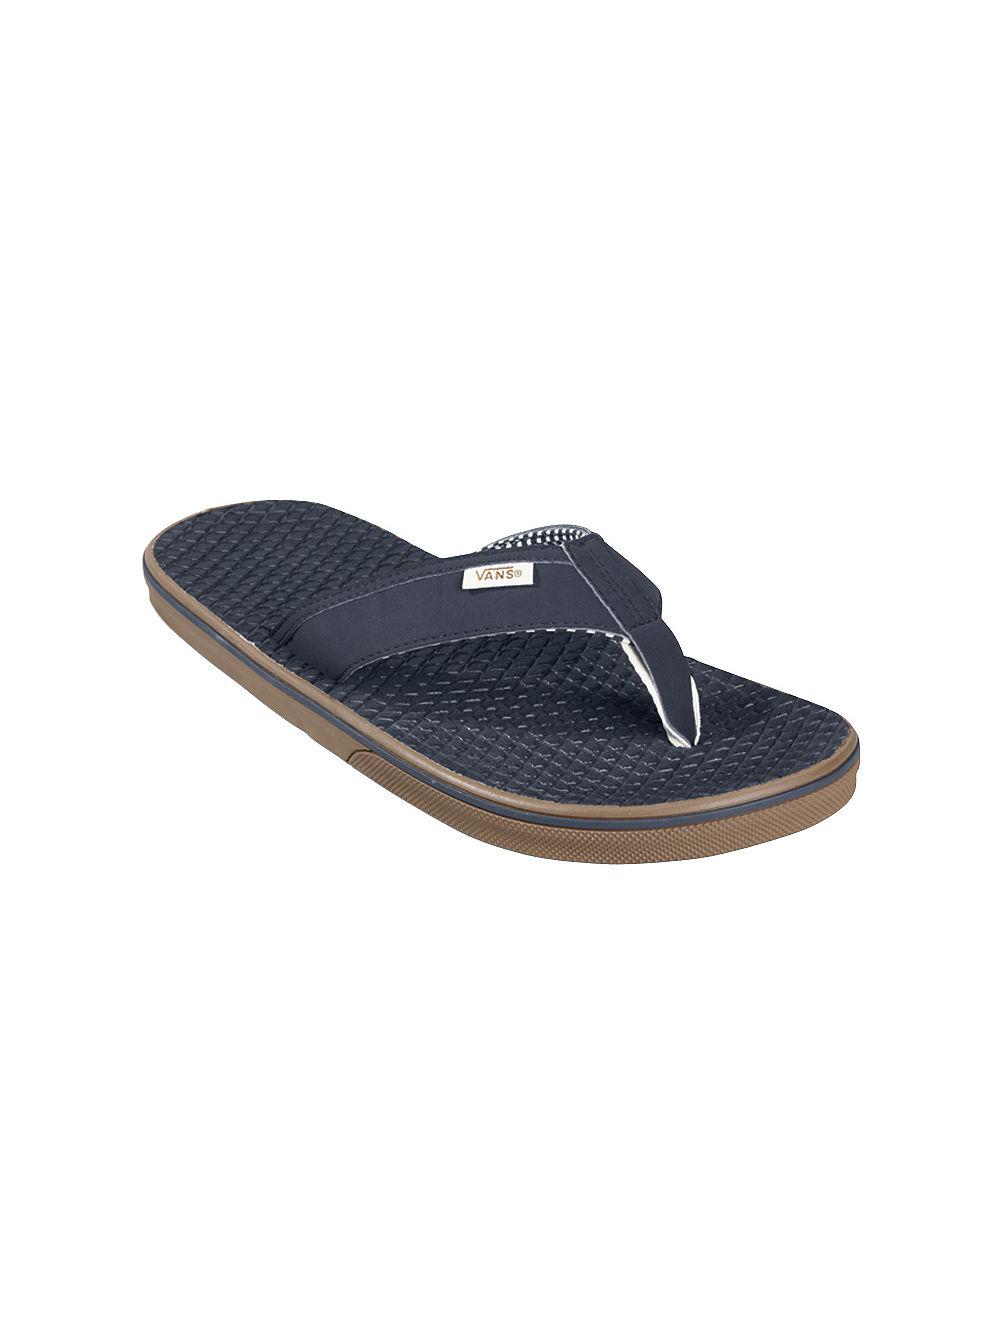 da9c1974a8 Buy Vans La Costa Sandals online at Blue Tomato